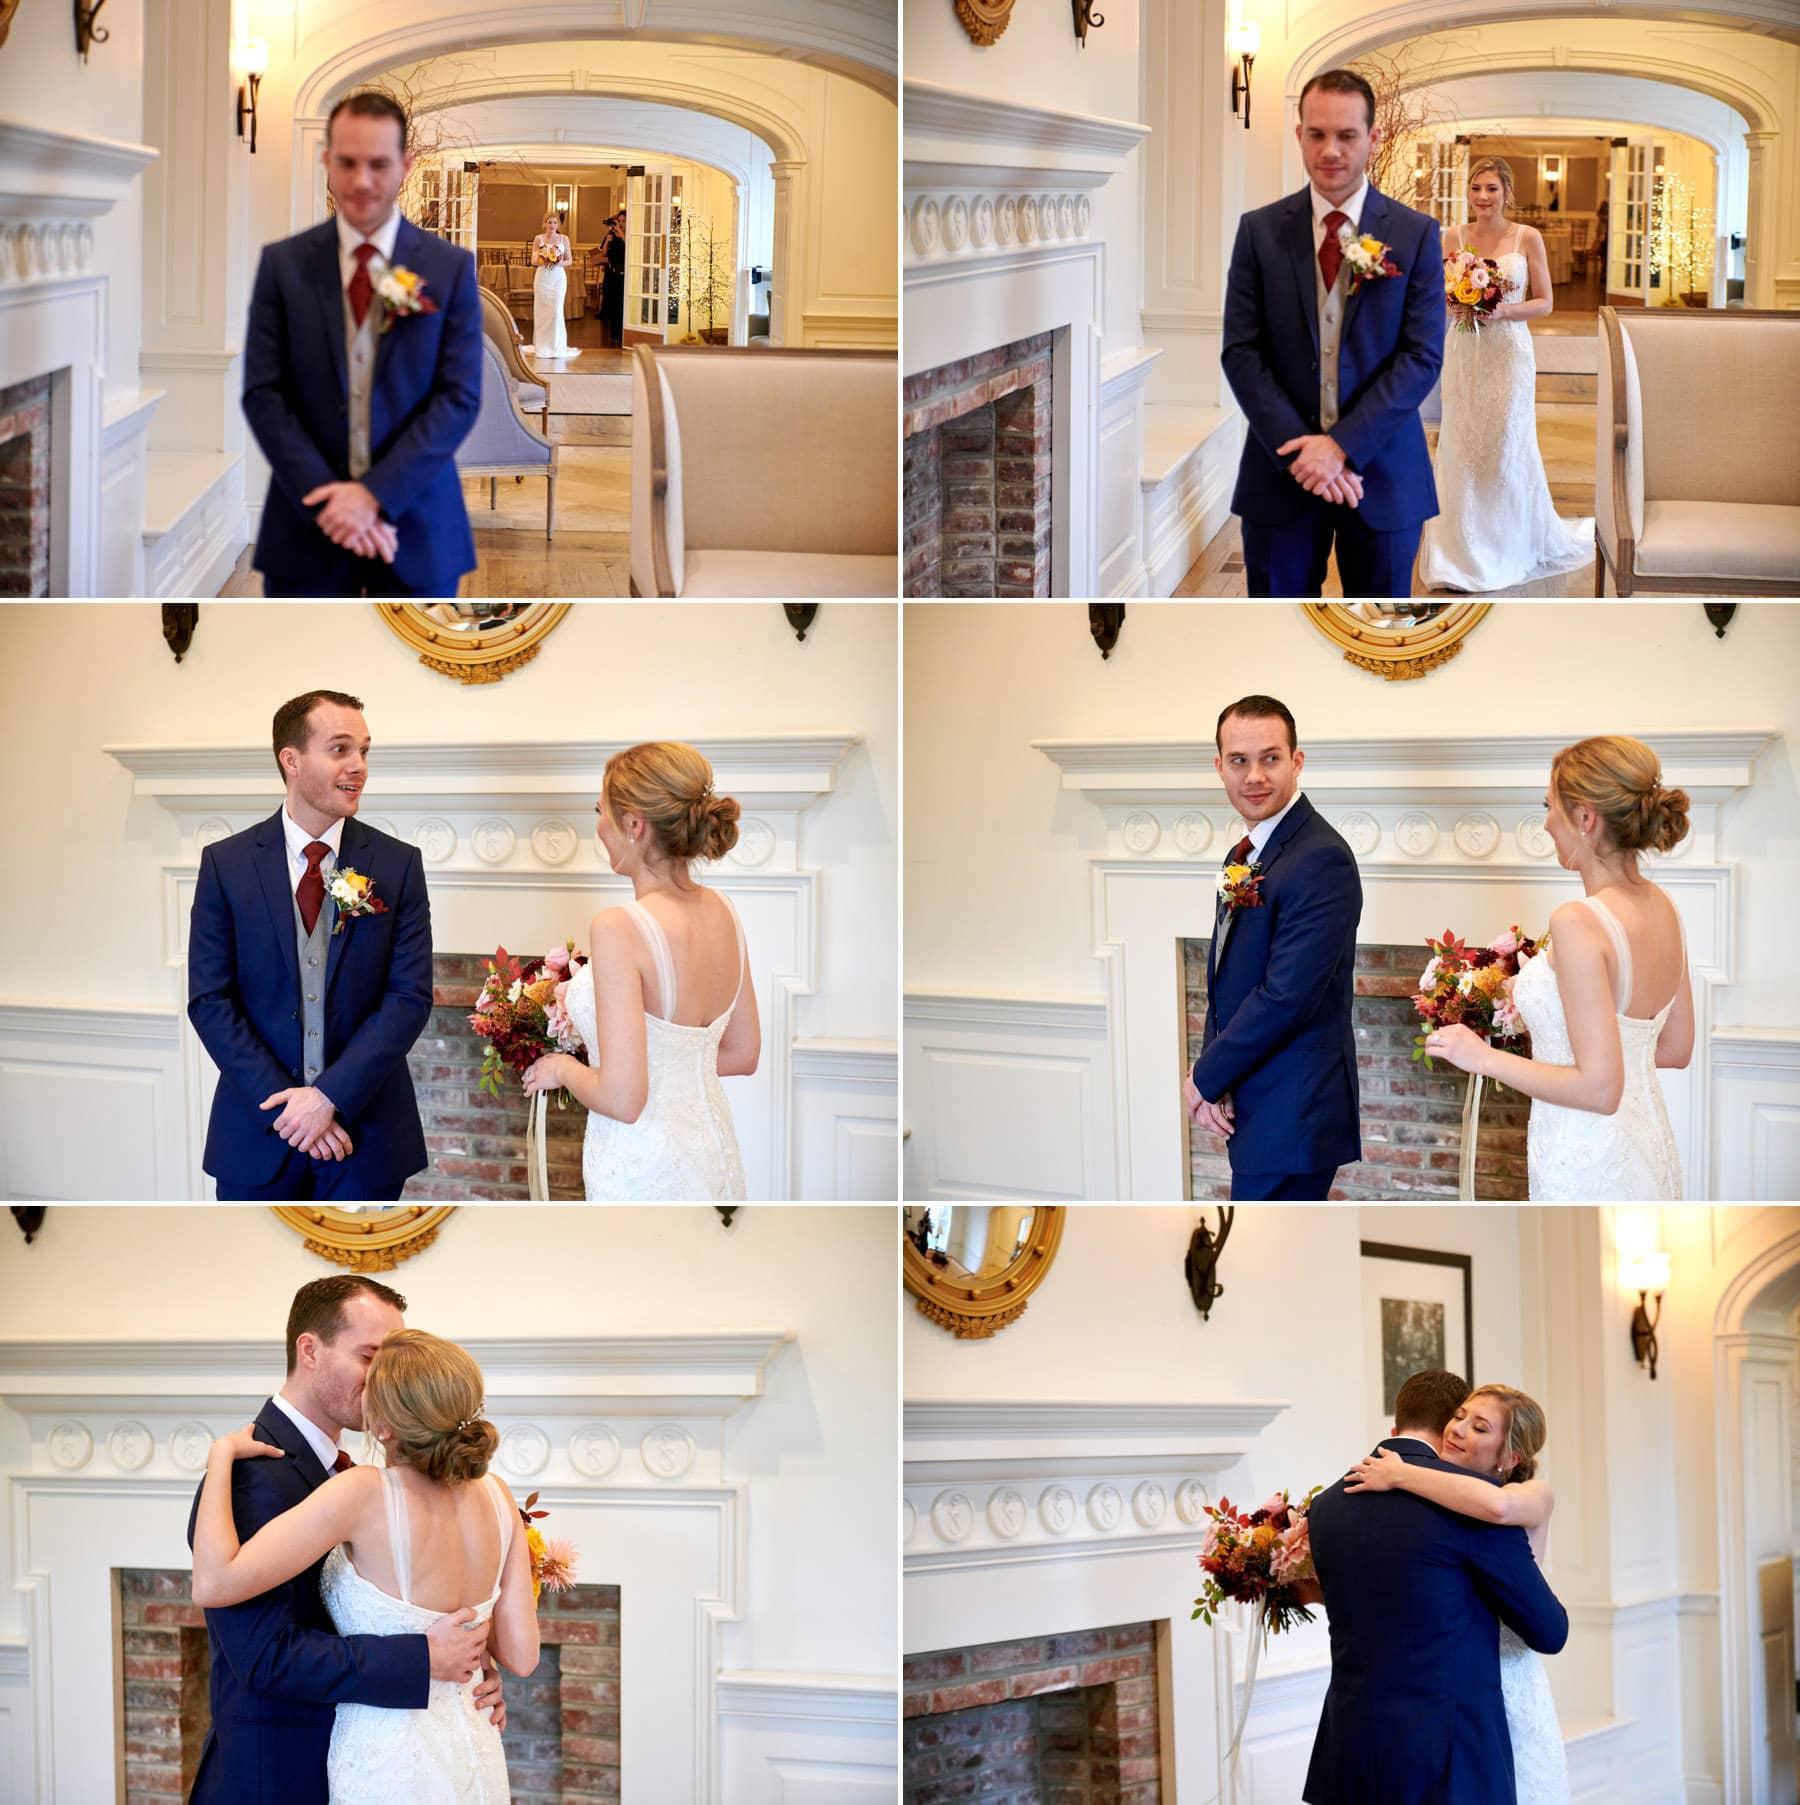 wedding first look photos at French Creek Golf Club